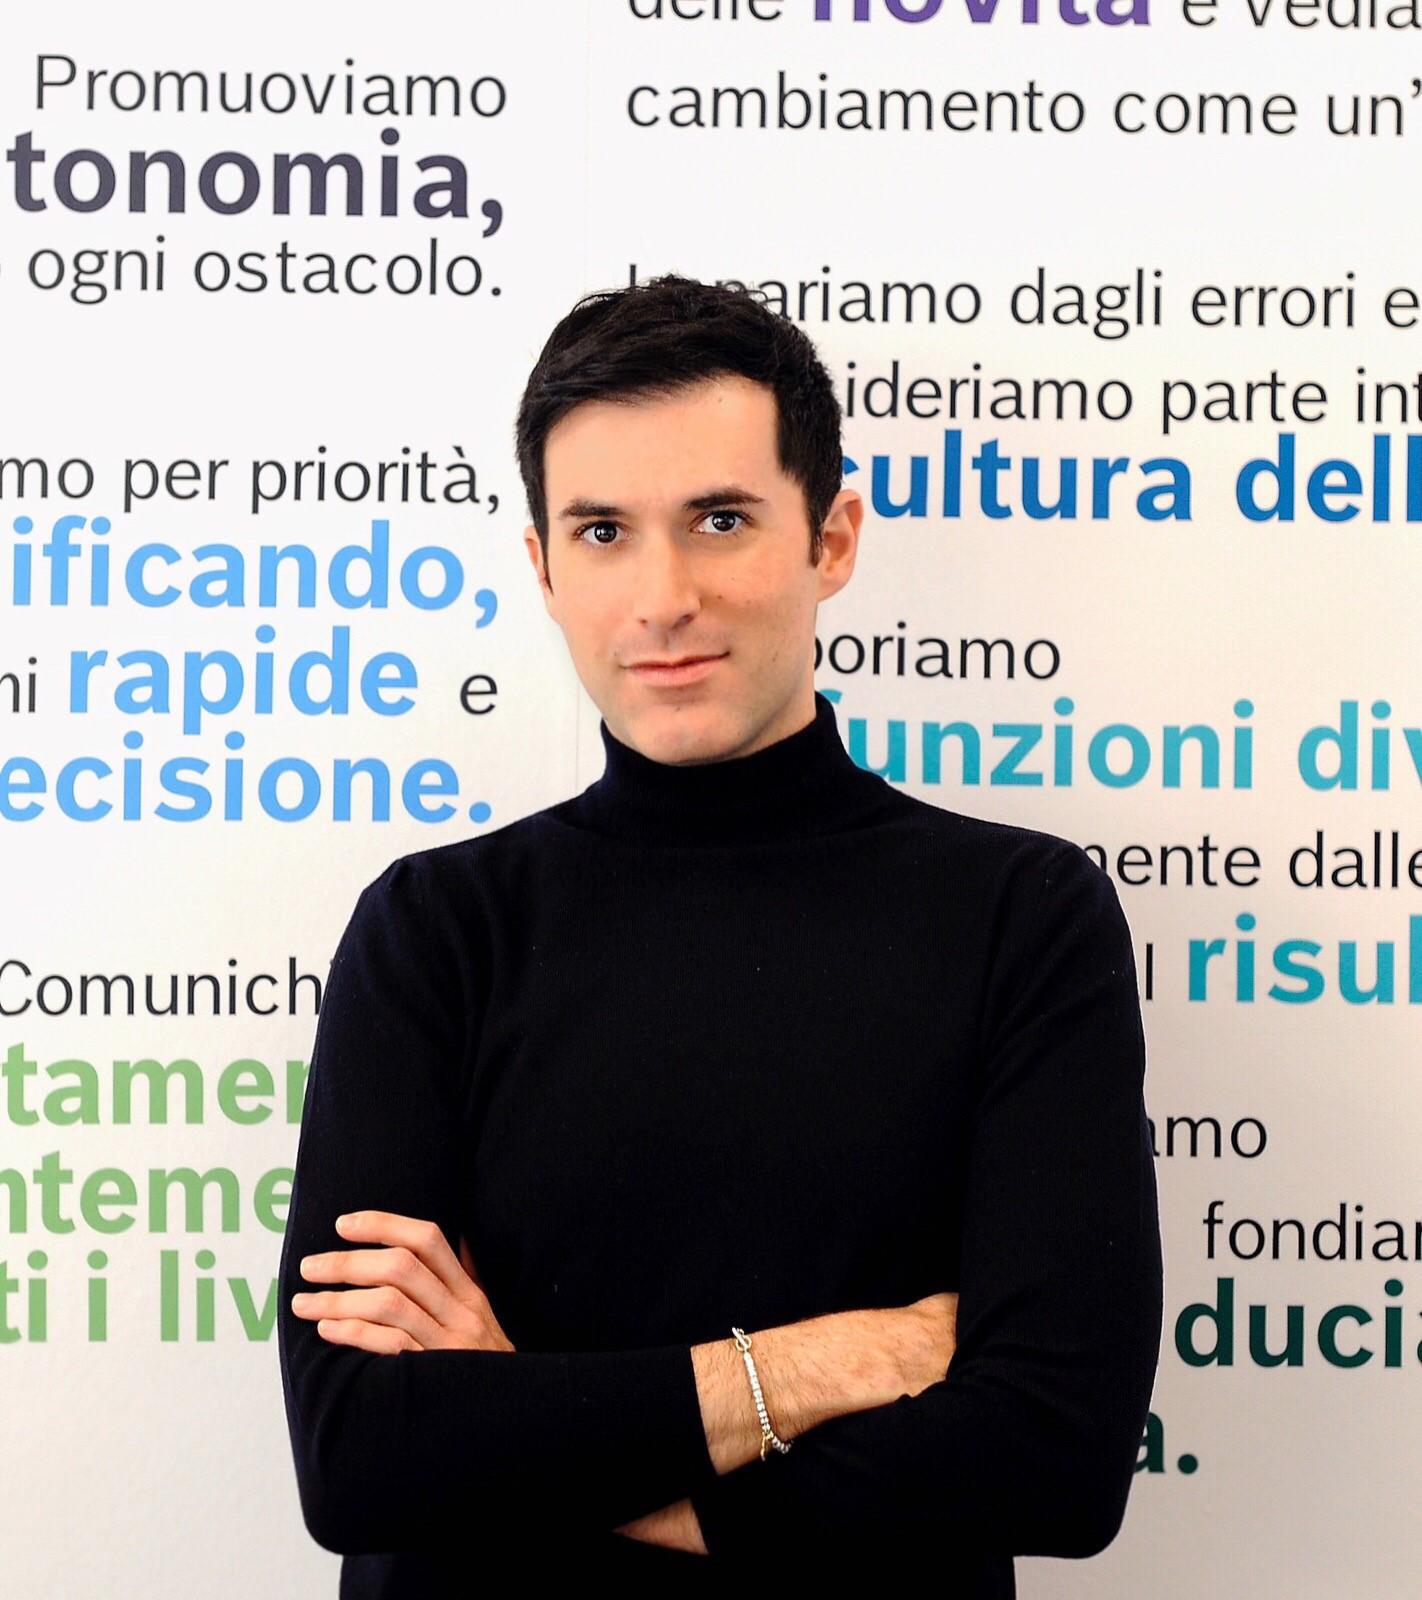 Angelo Formenti